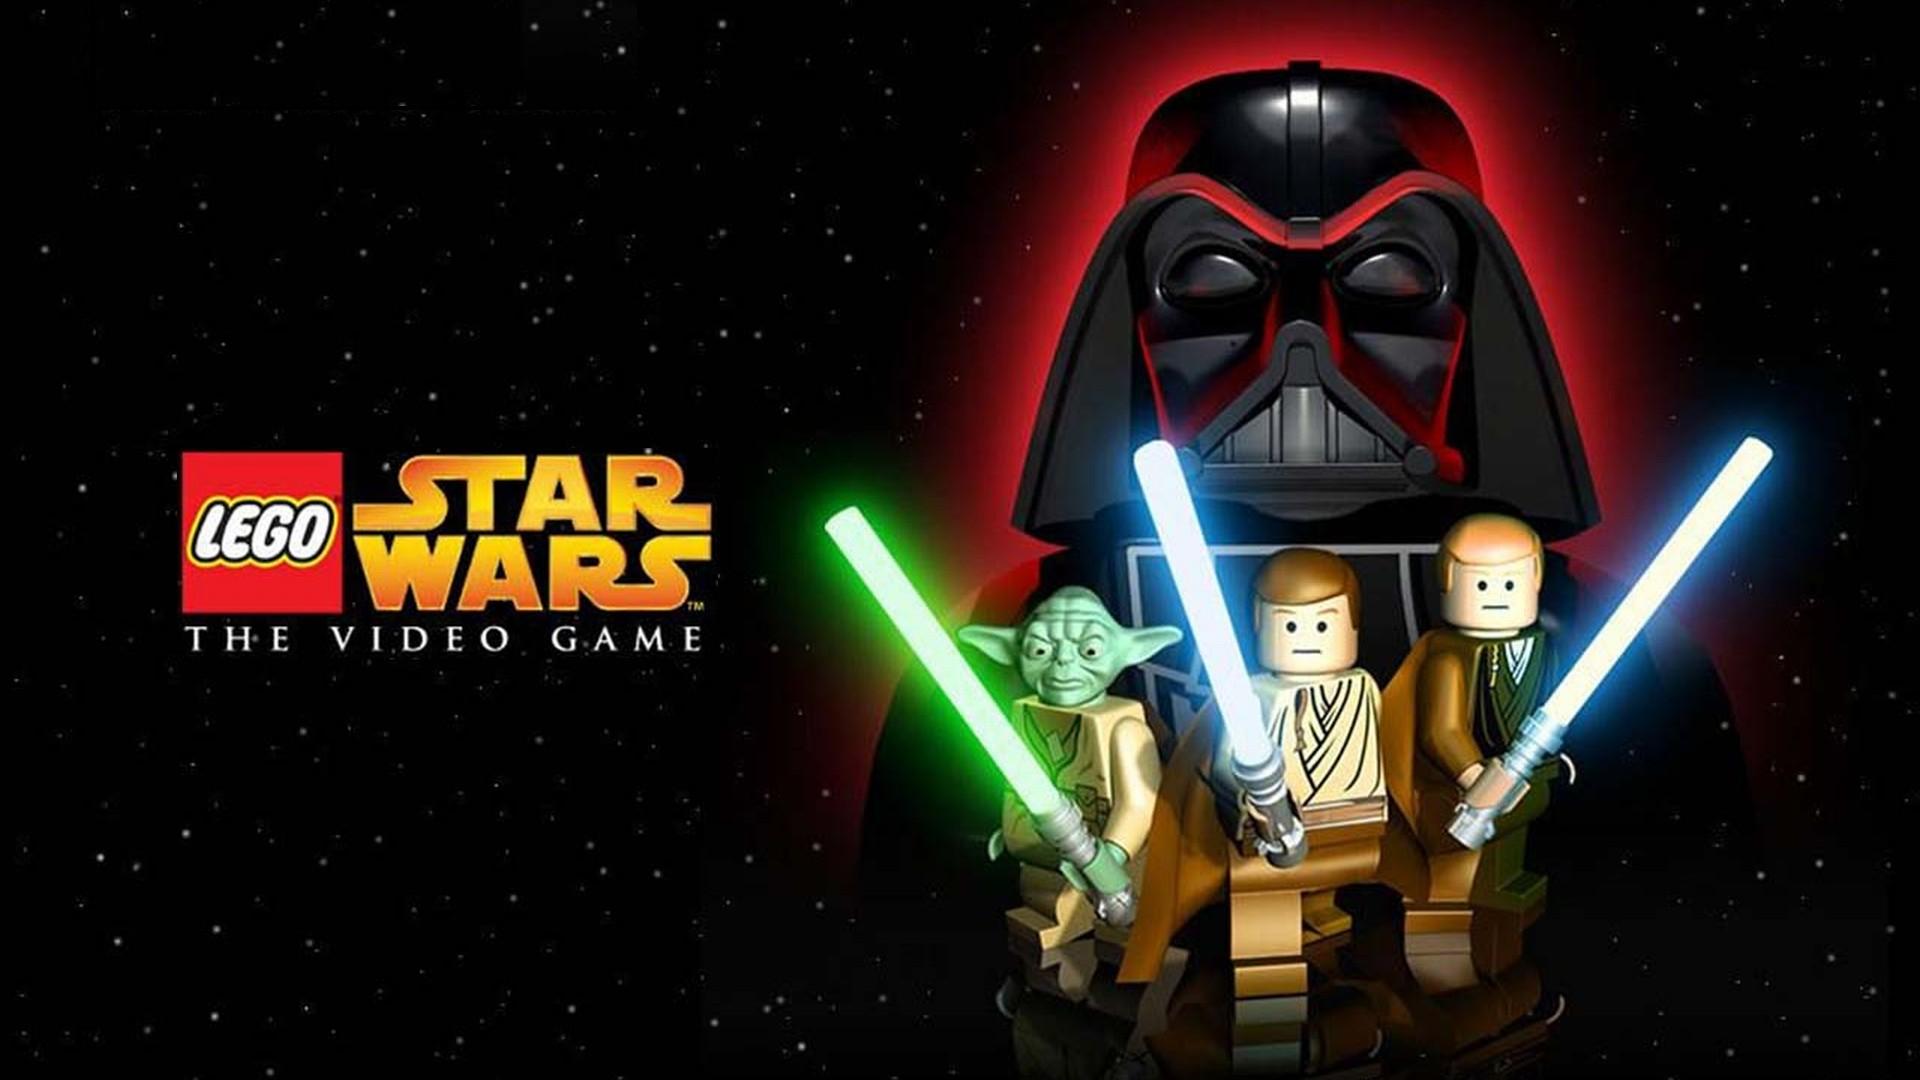 lego star wars iphone wallpaper